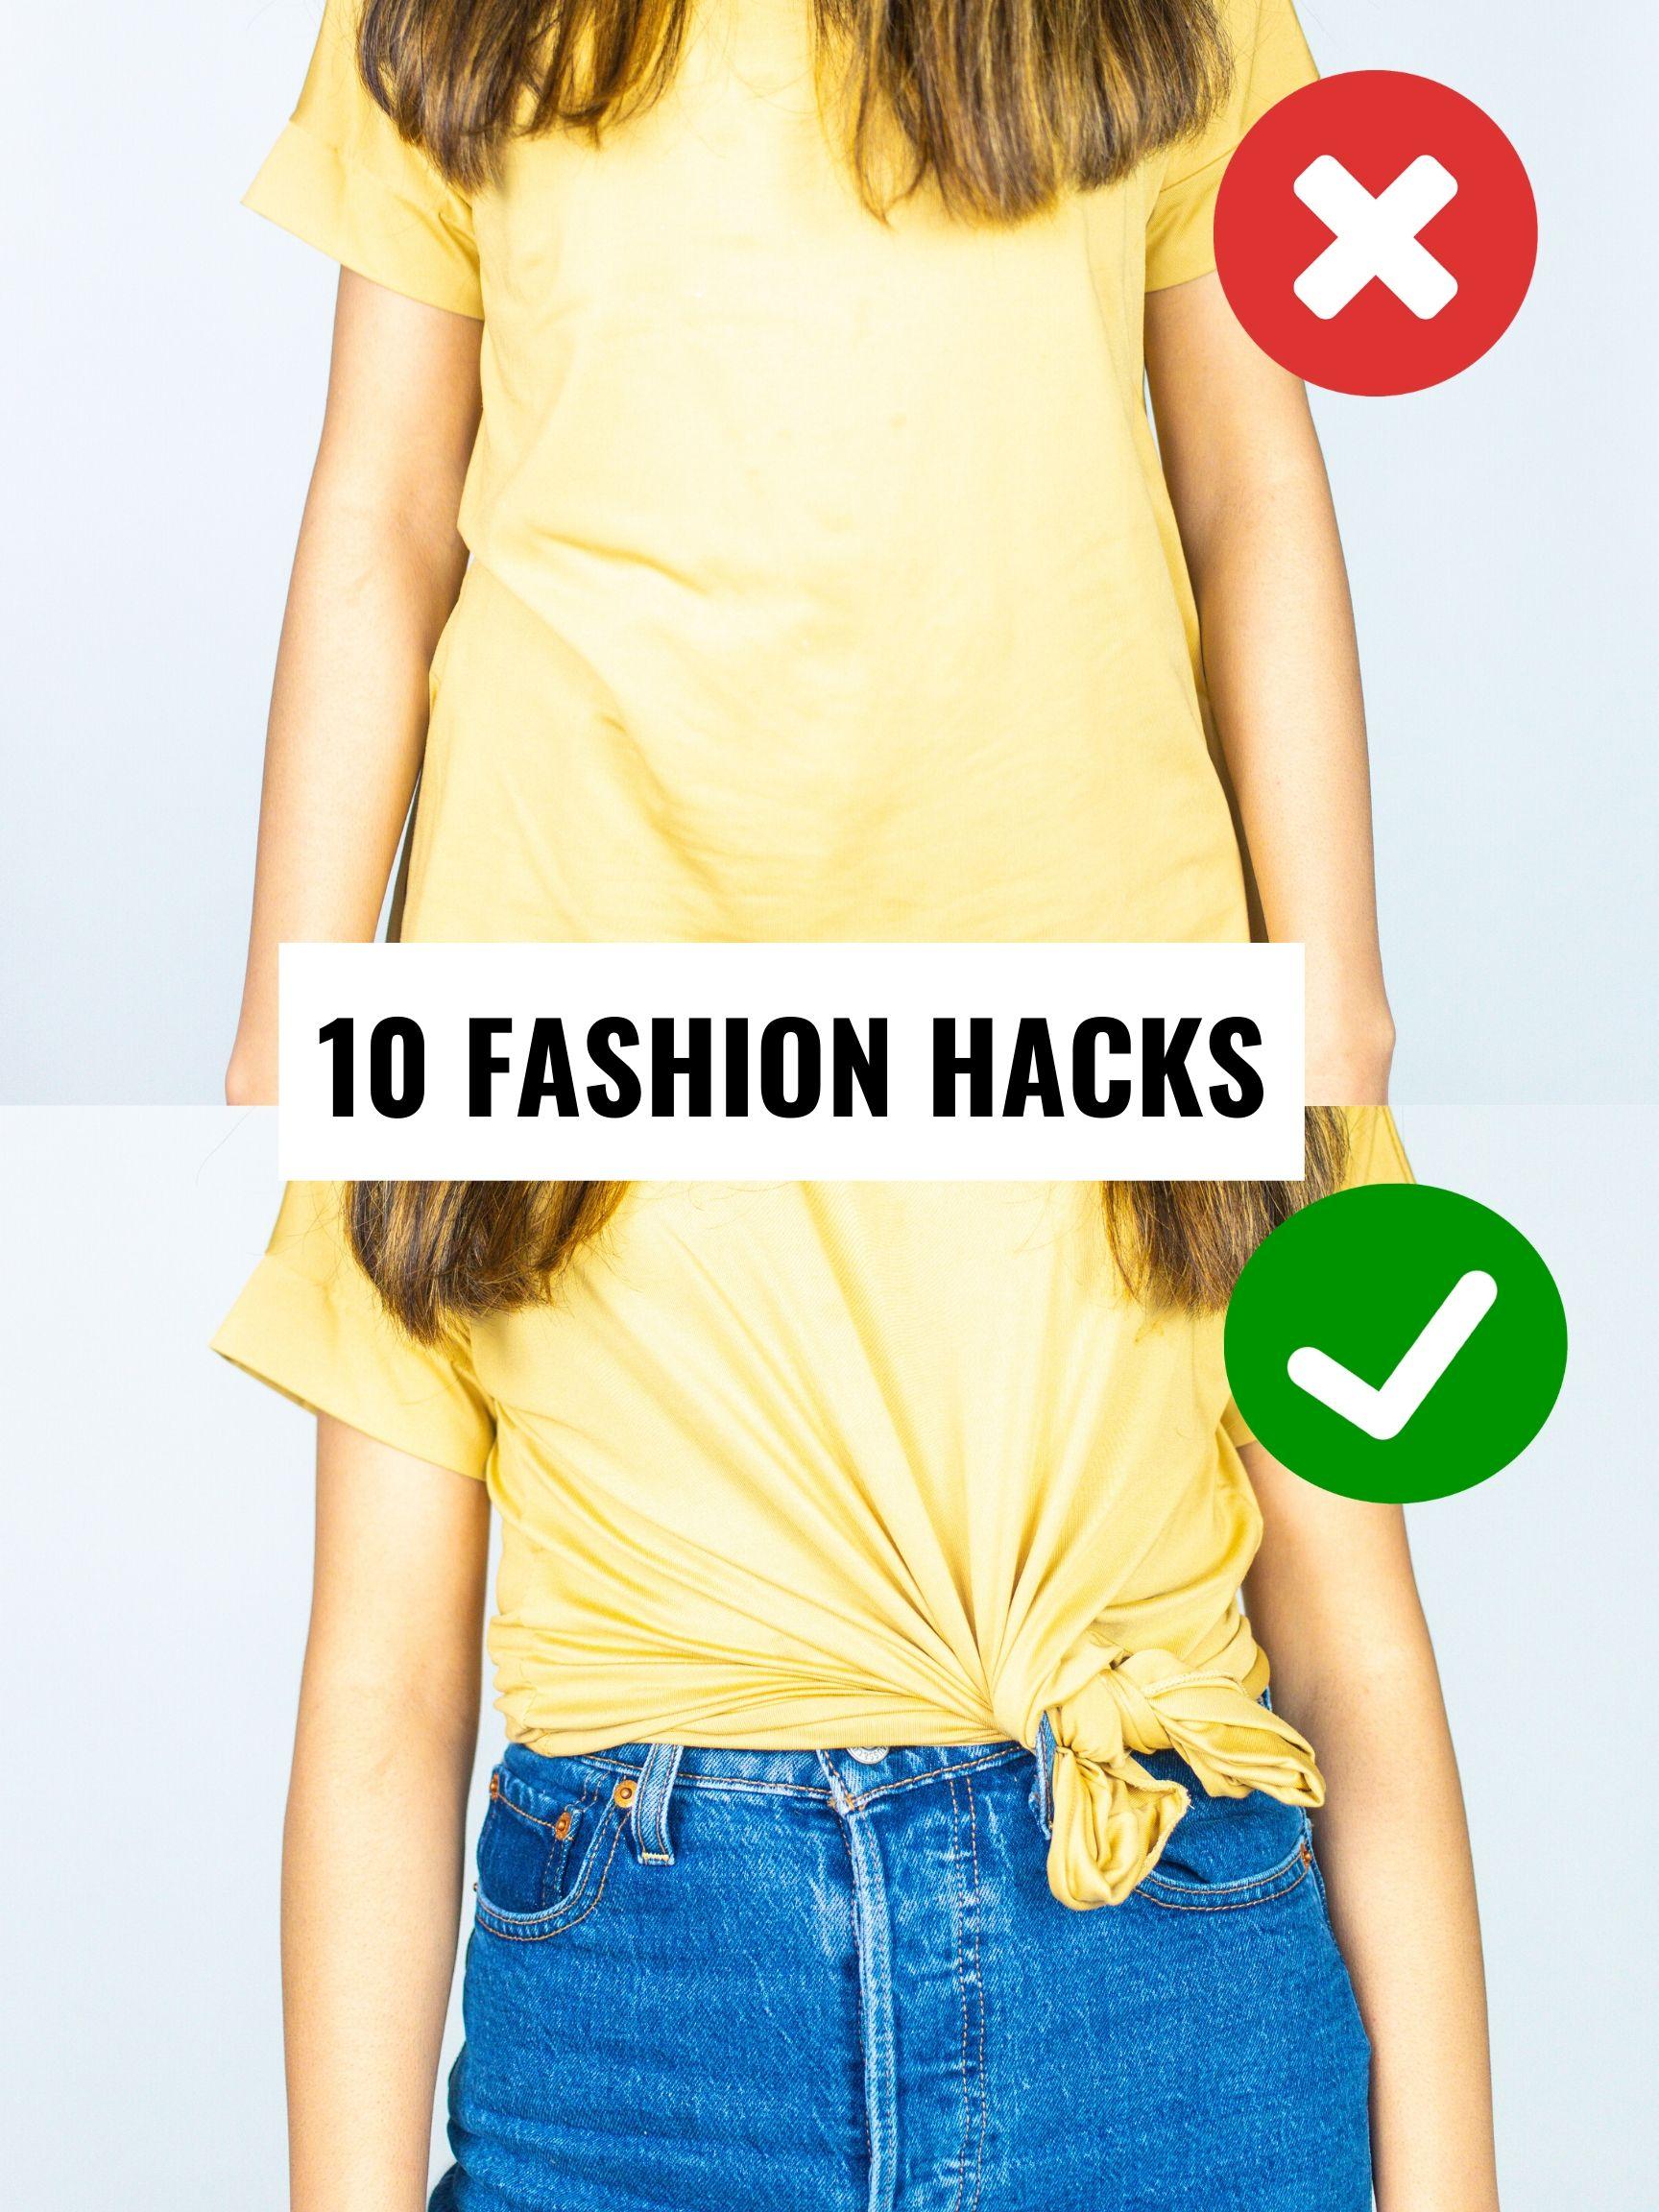 10 fashion hacks to muust do every women should know